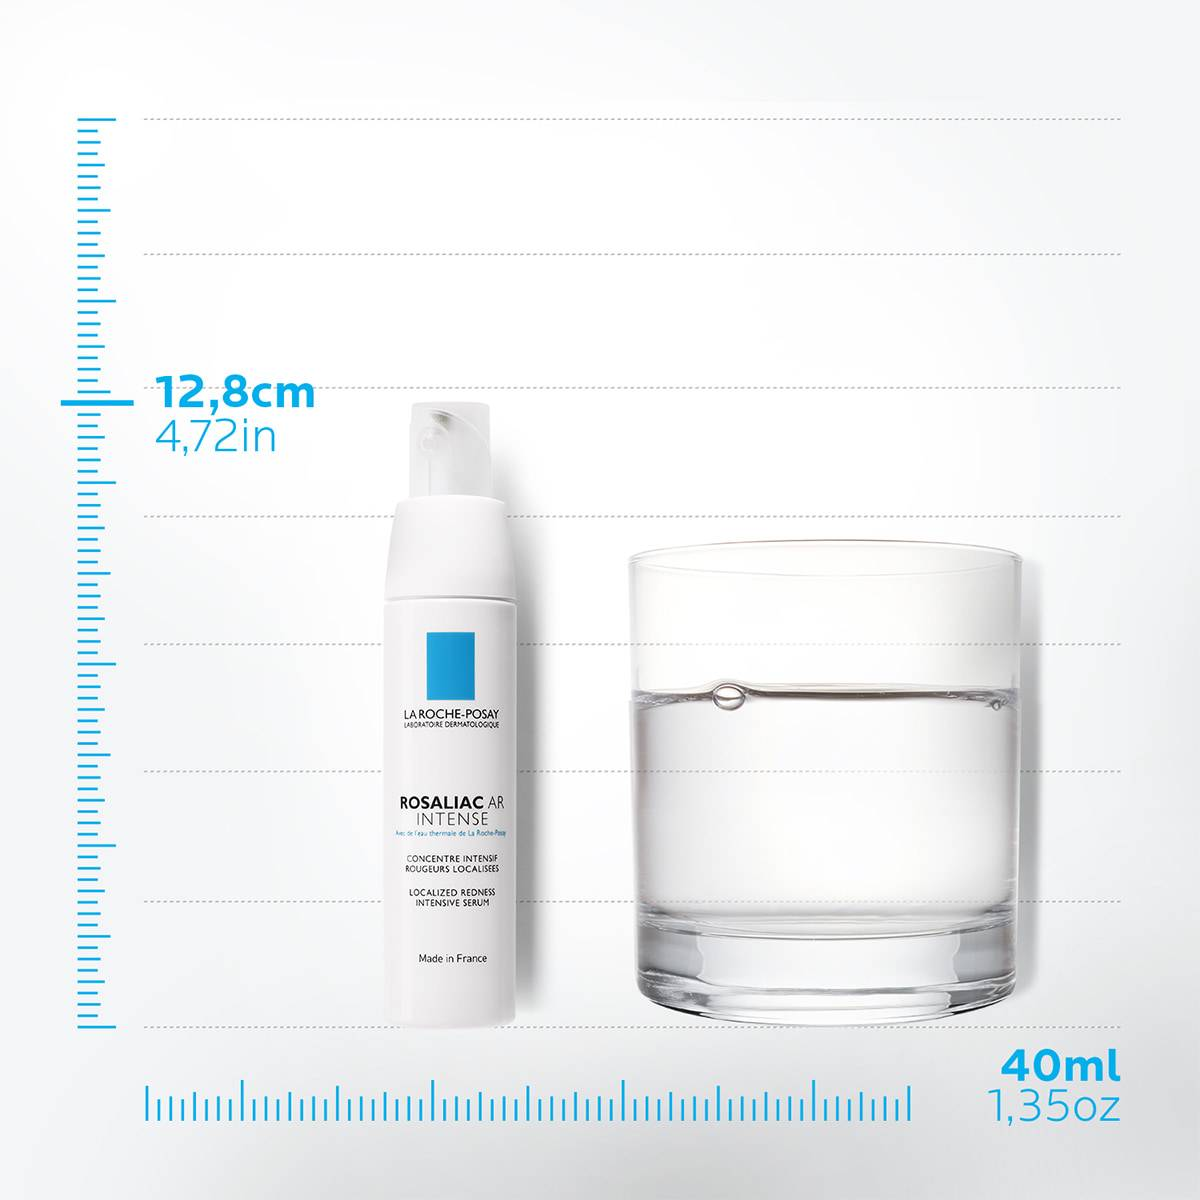 La Roche Posay ProduktSide Ansigtspleje Rosaliac AR Intens 40ml 33378724